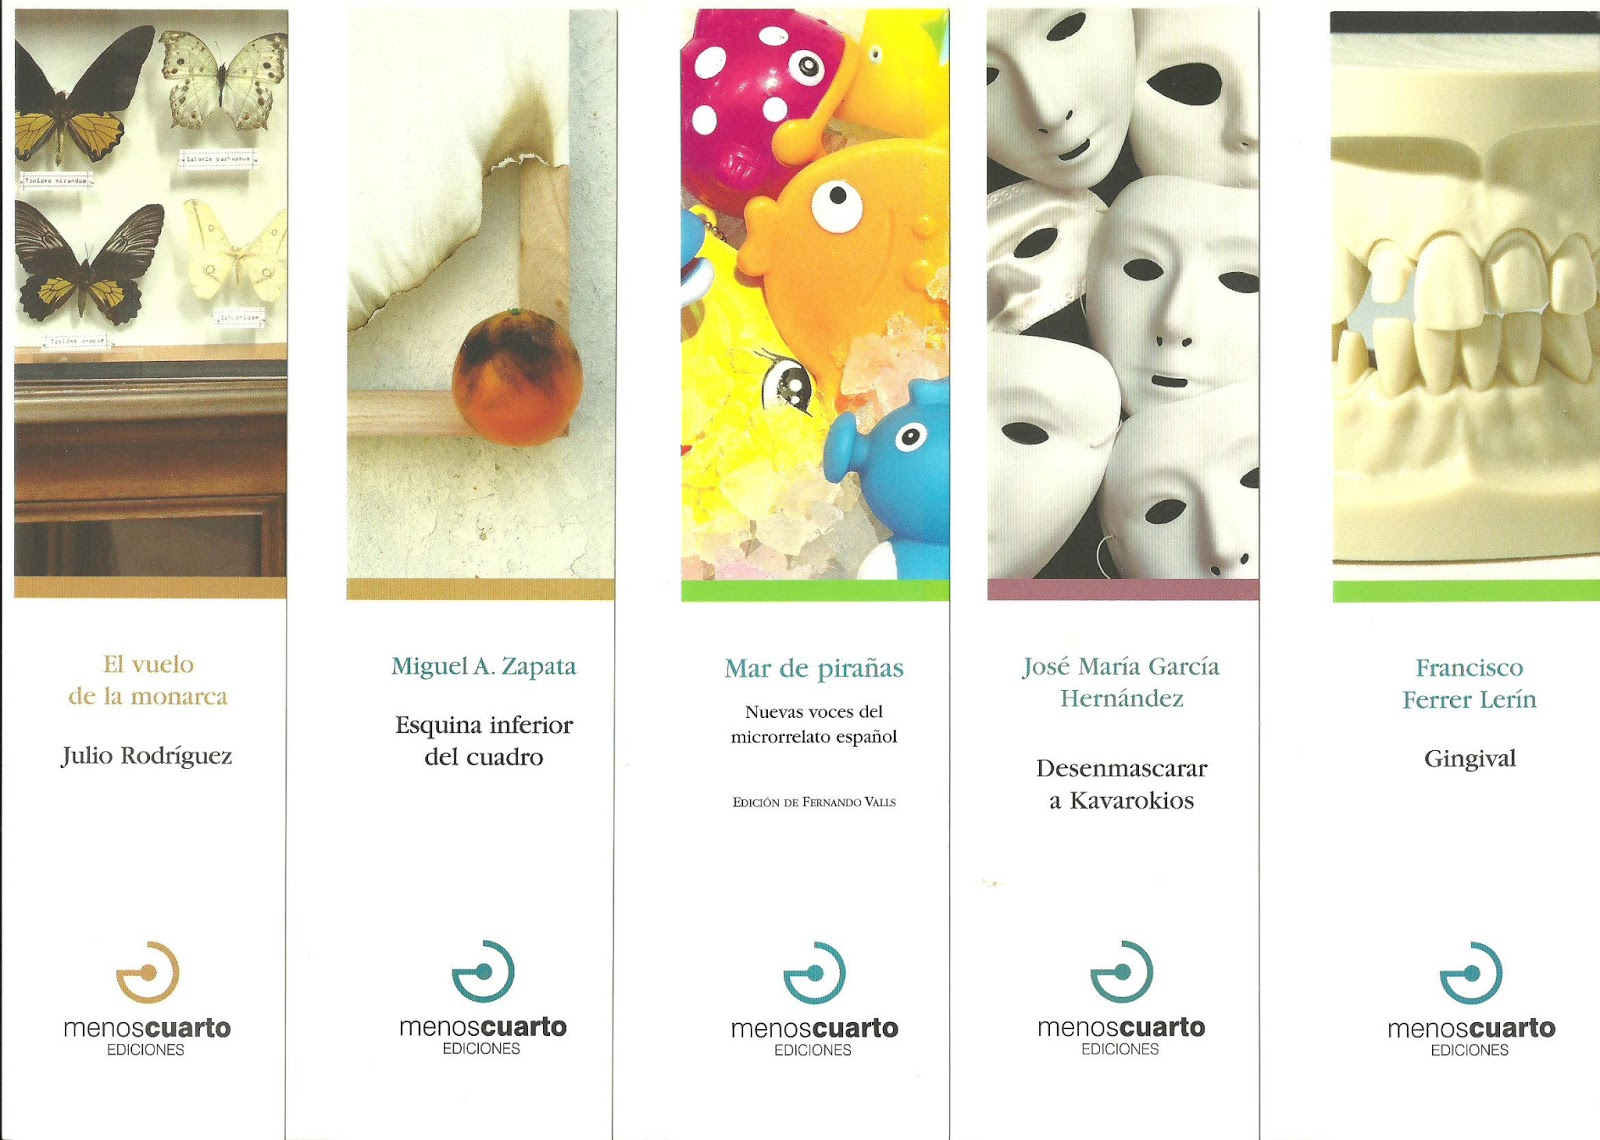 els punts de llibre: Editorial Menos Cuarto 2013